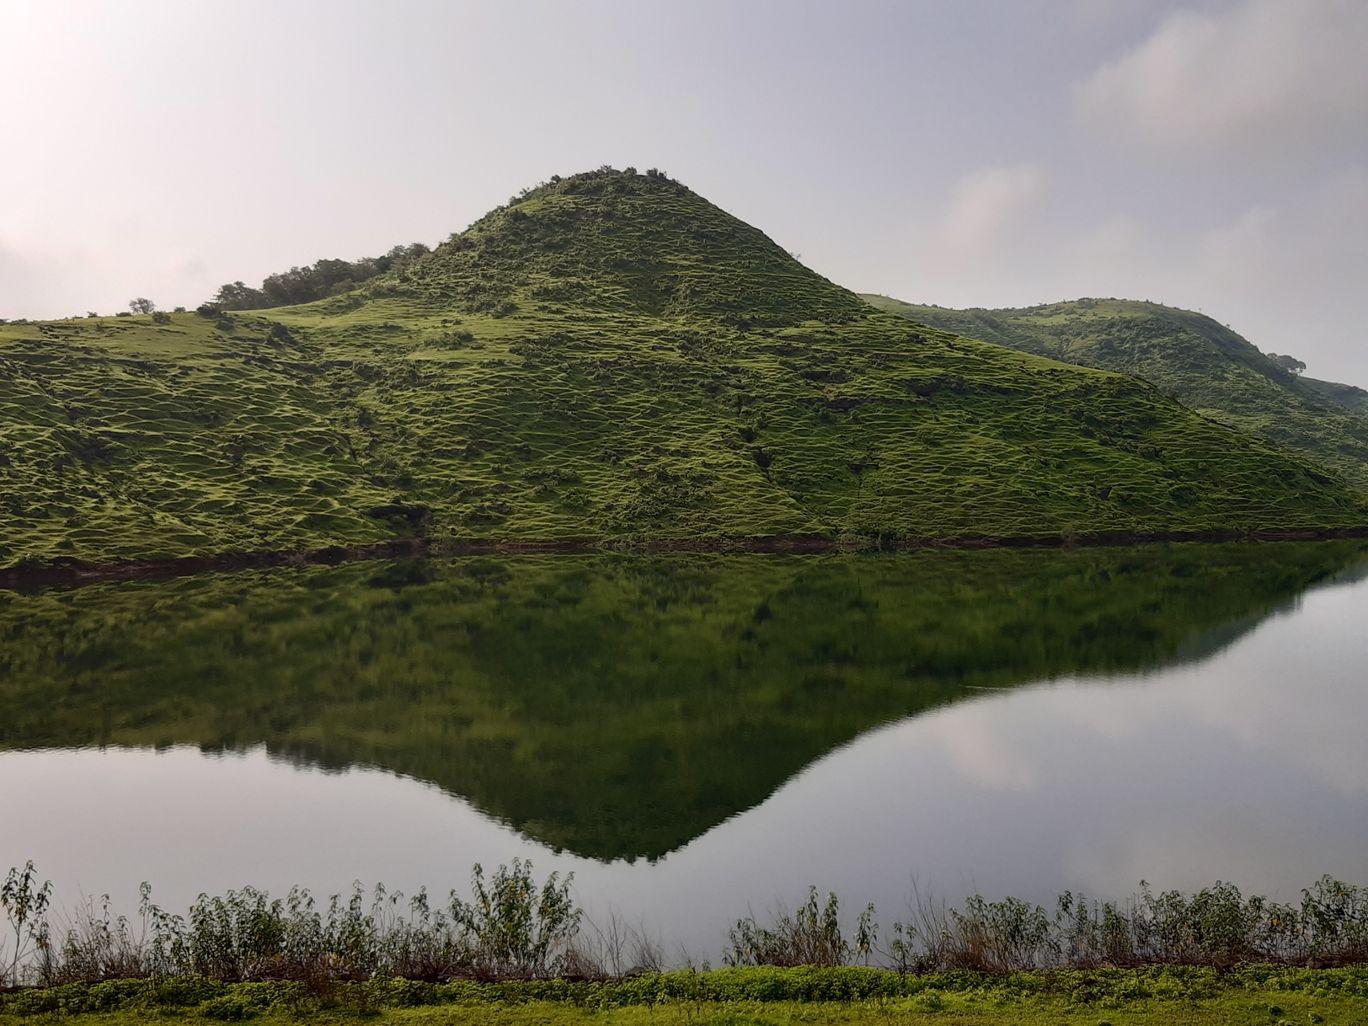 Photo of Garbett Point By Chaturvedi Rohit